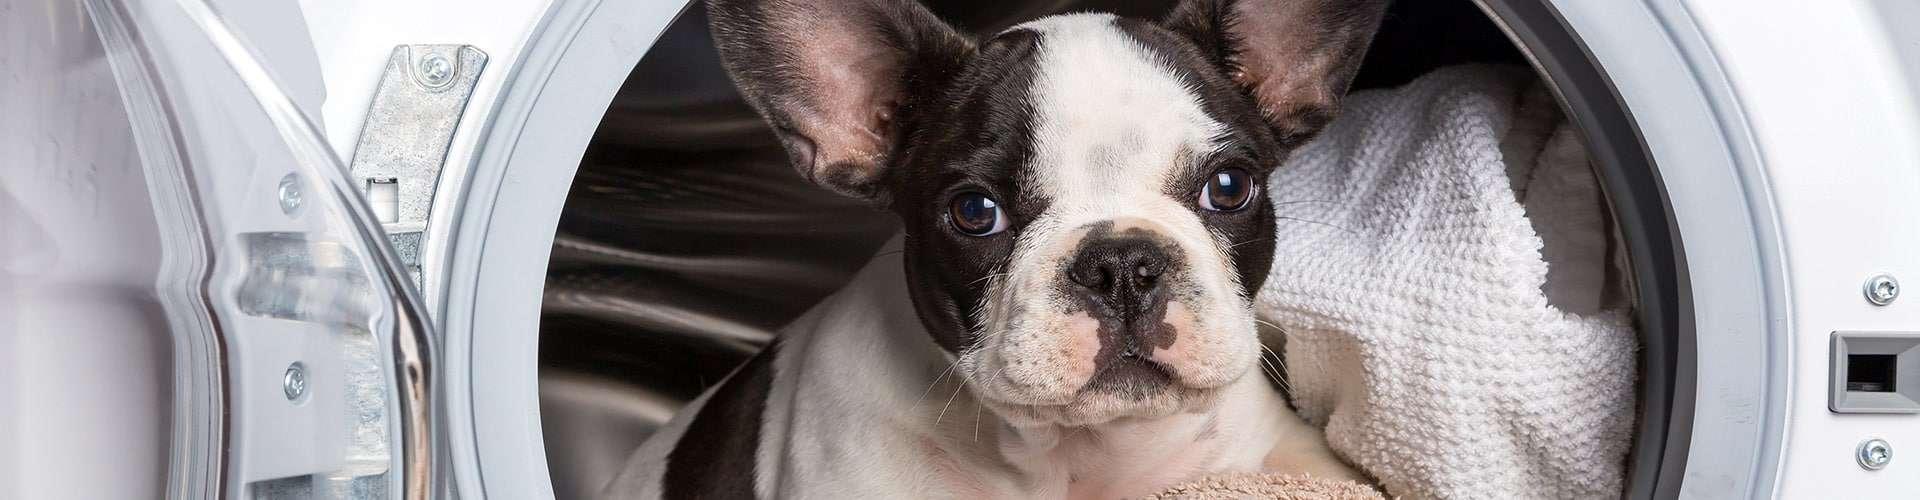 dog ear cleaning geneva, il